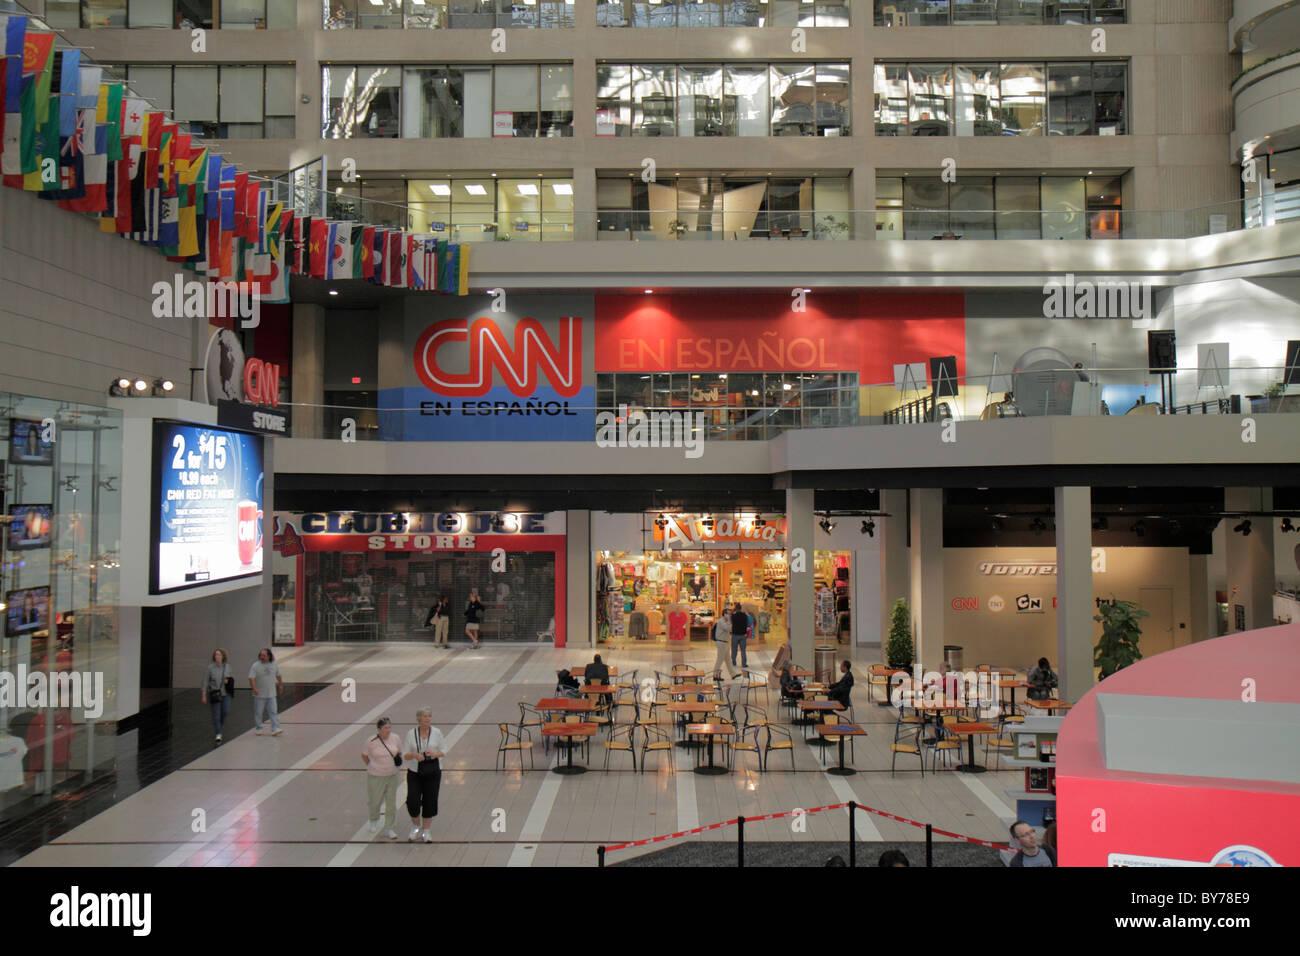 Restaurants In Cnn Center Food Court Atlanta